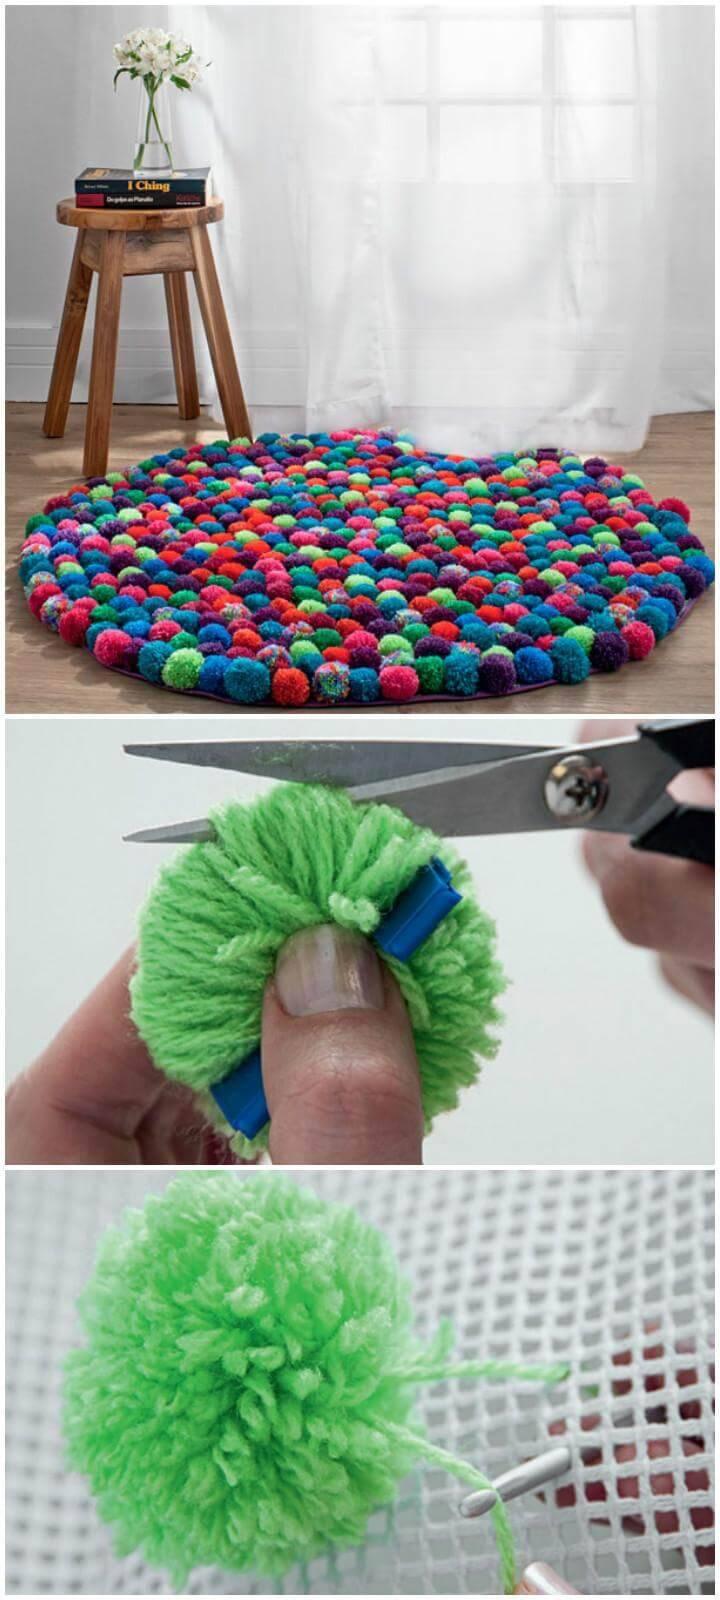 DIY Brilliant Pom Pom Rug